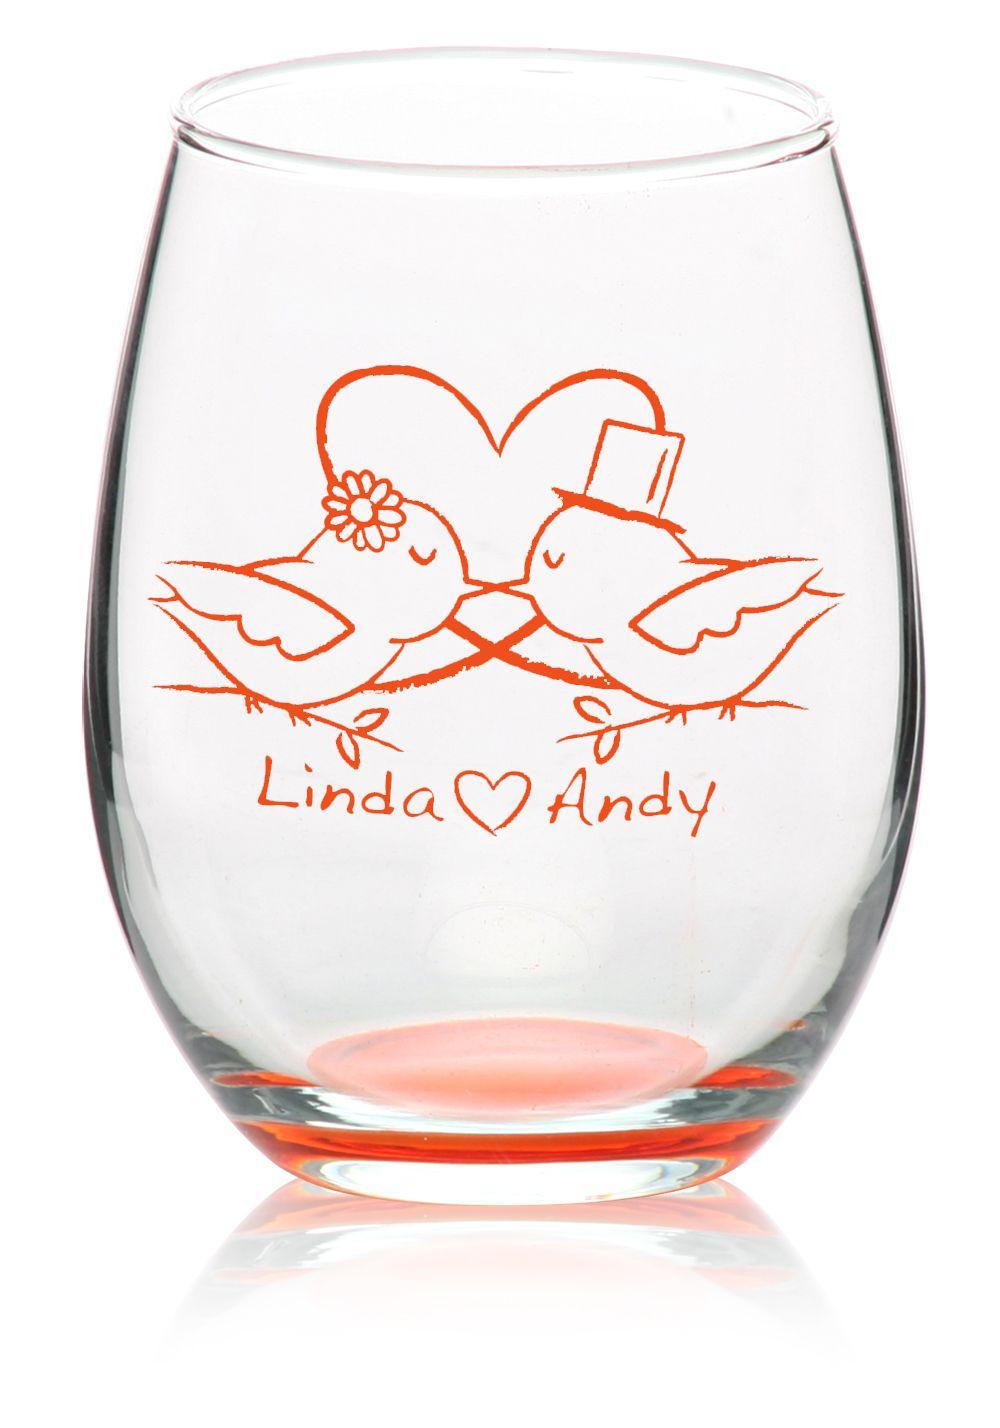 Custom Stemless Wine Glasses - Personalized Wine Glasses   Wine ...